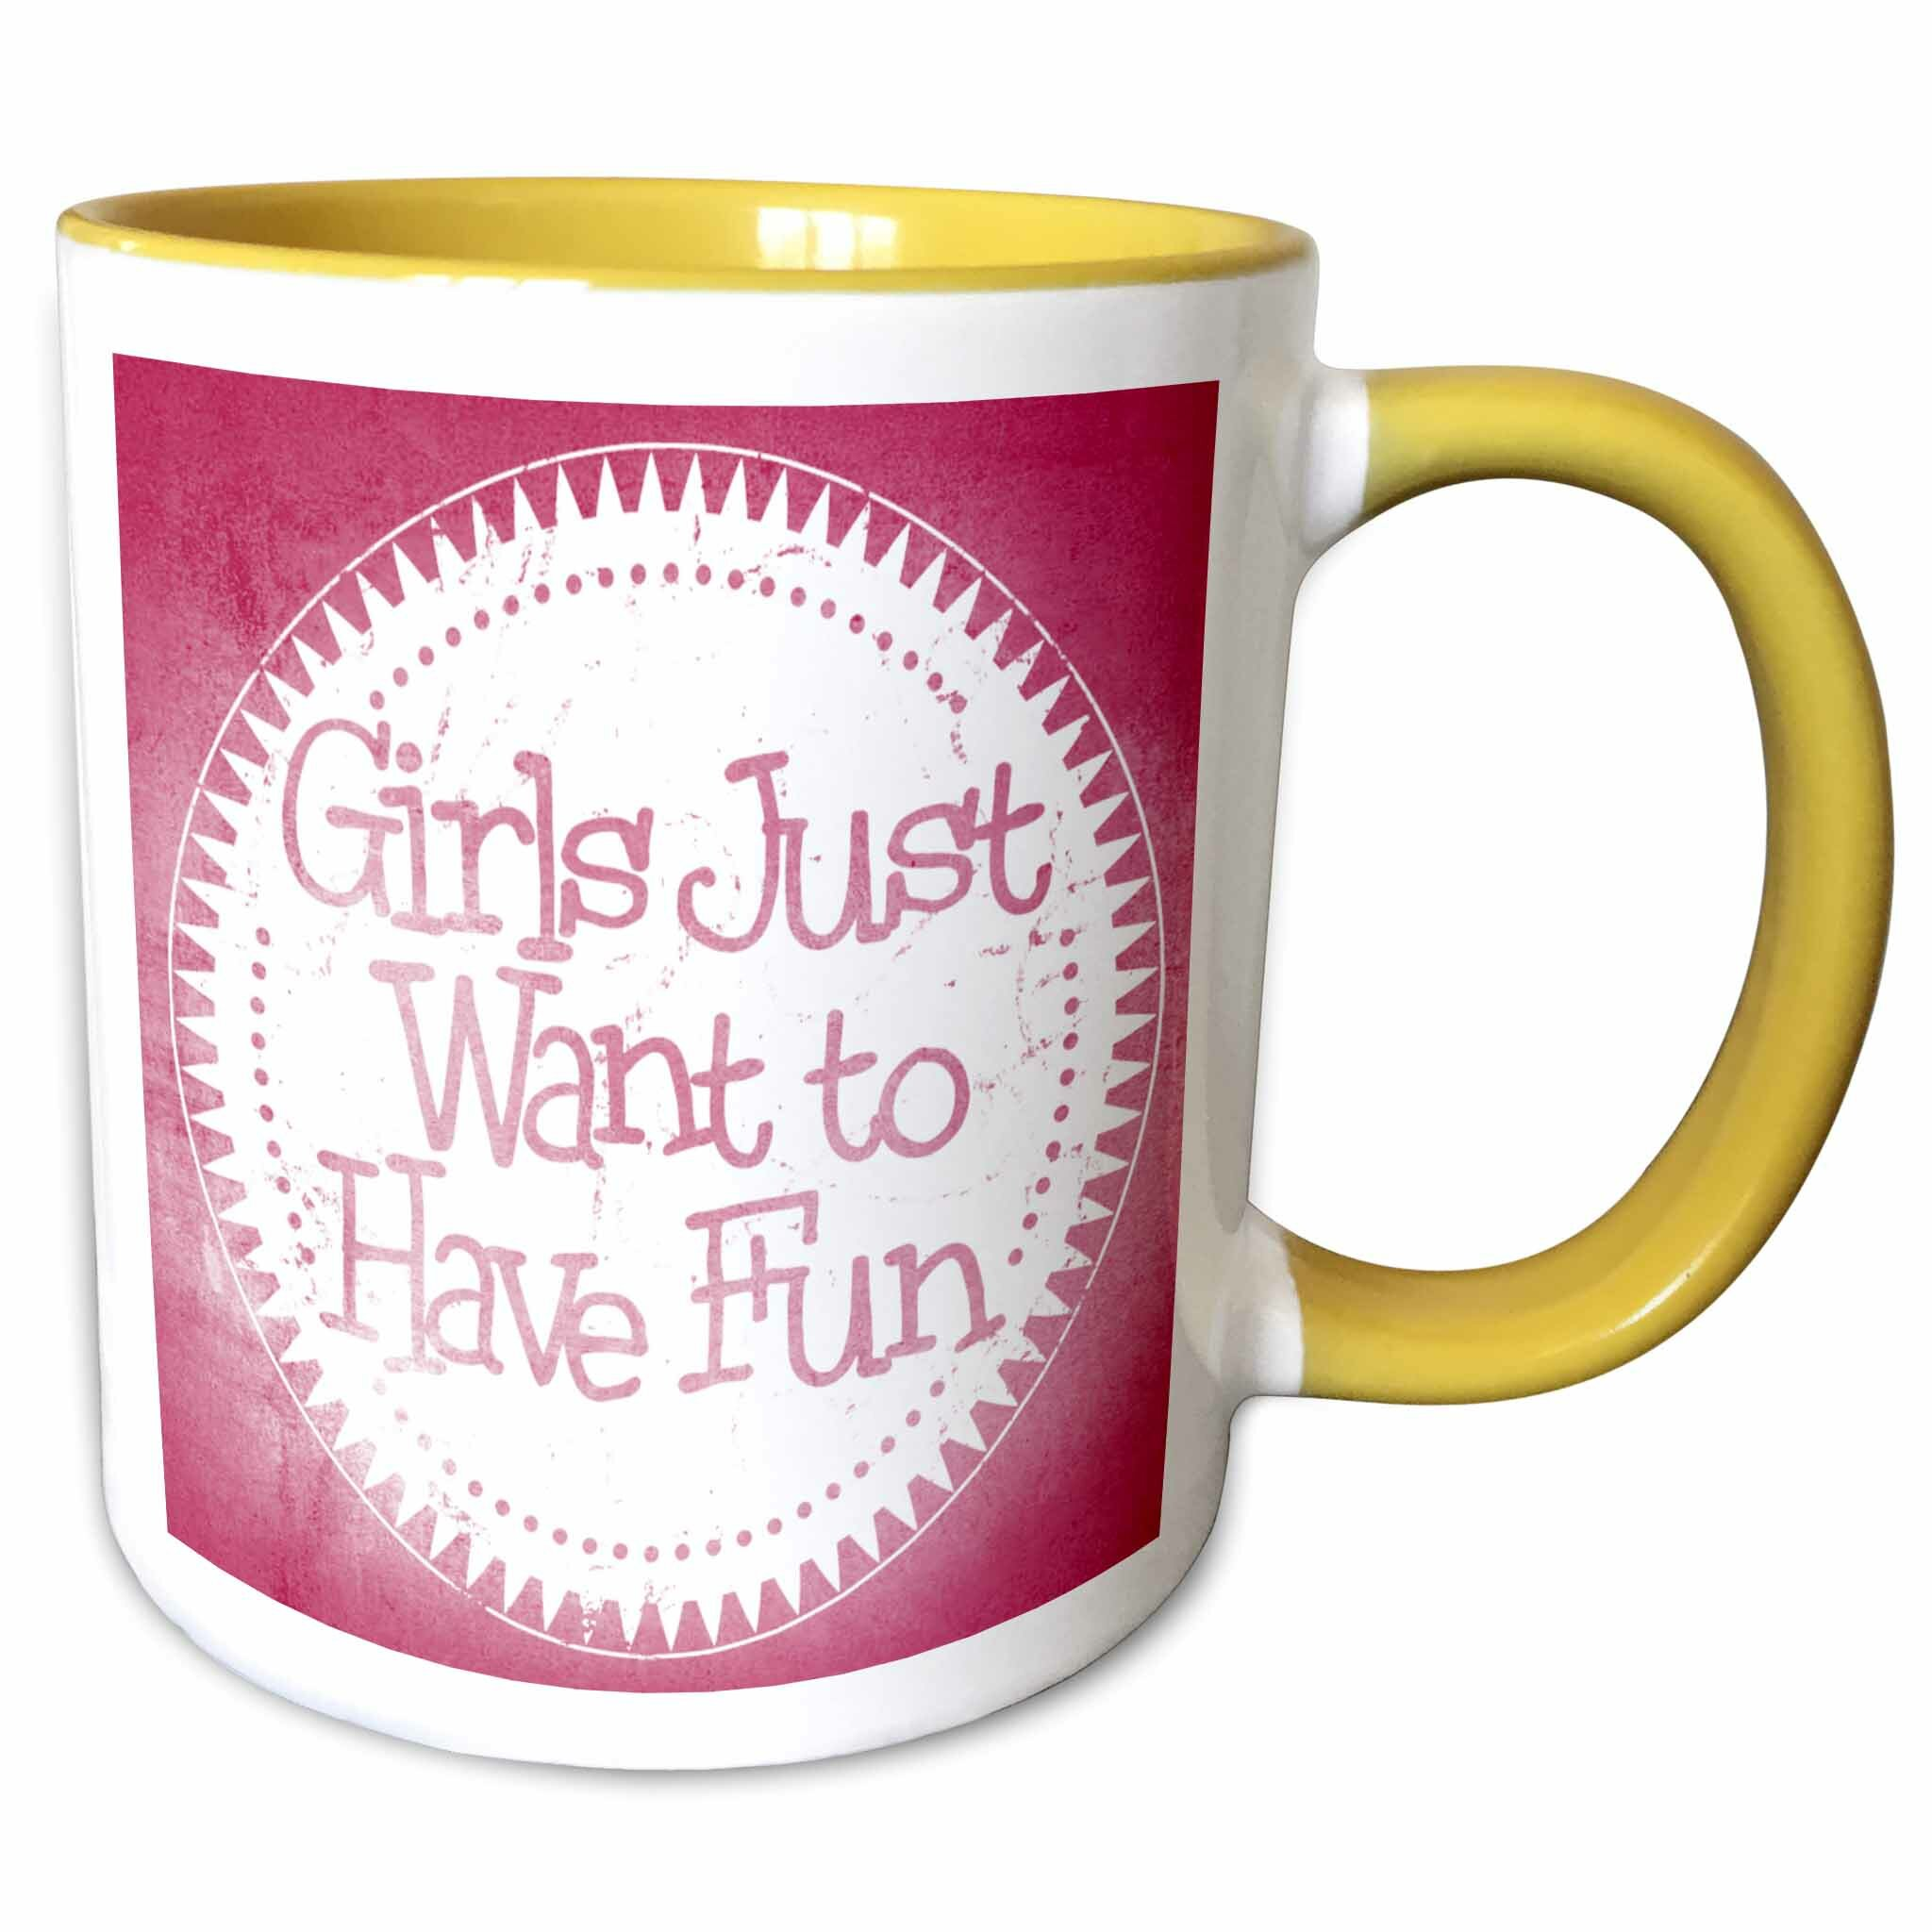 East Urban Home Girls Just Want To Have Fun Word Art Coffee Mug Wayfair